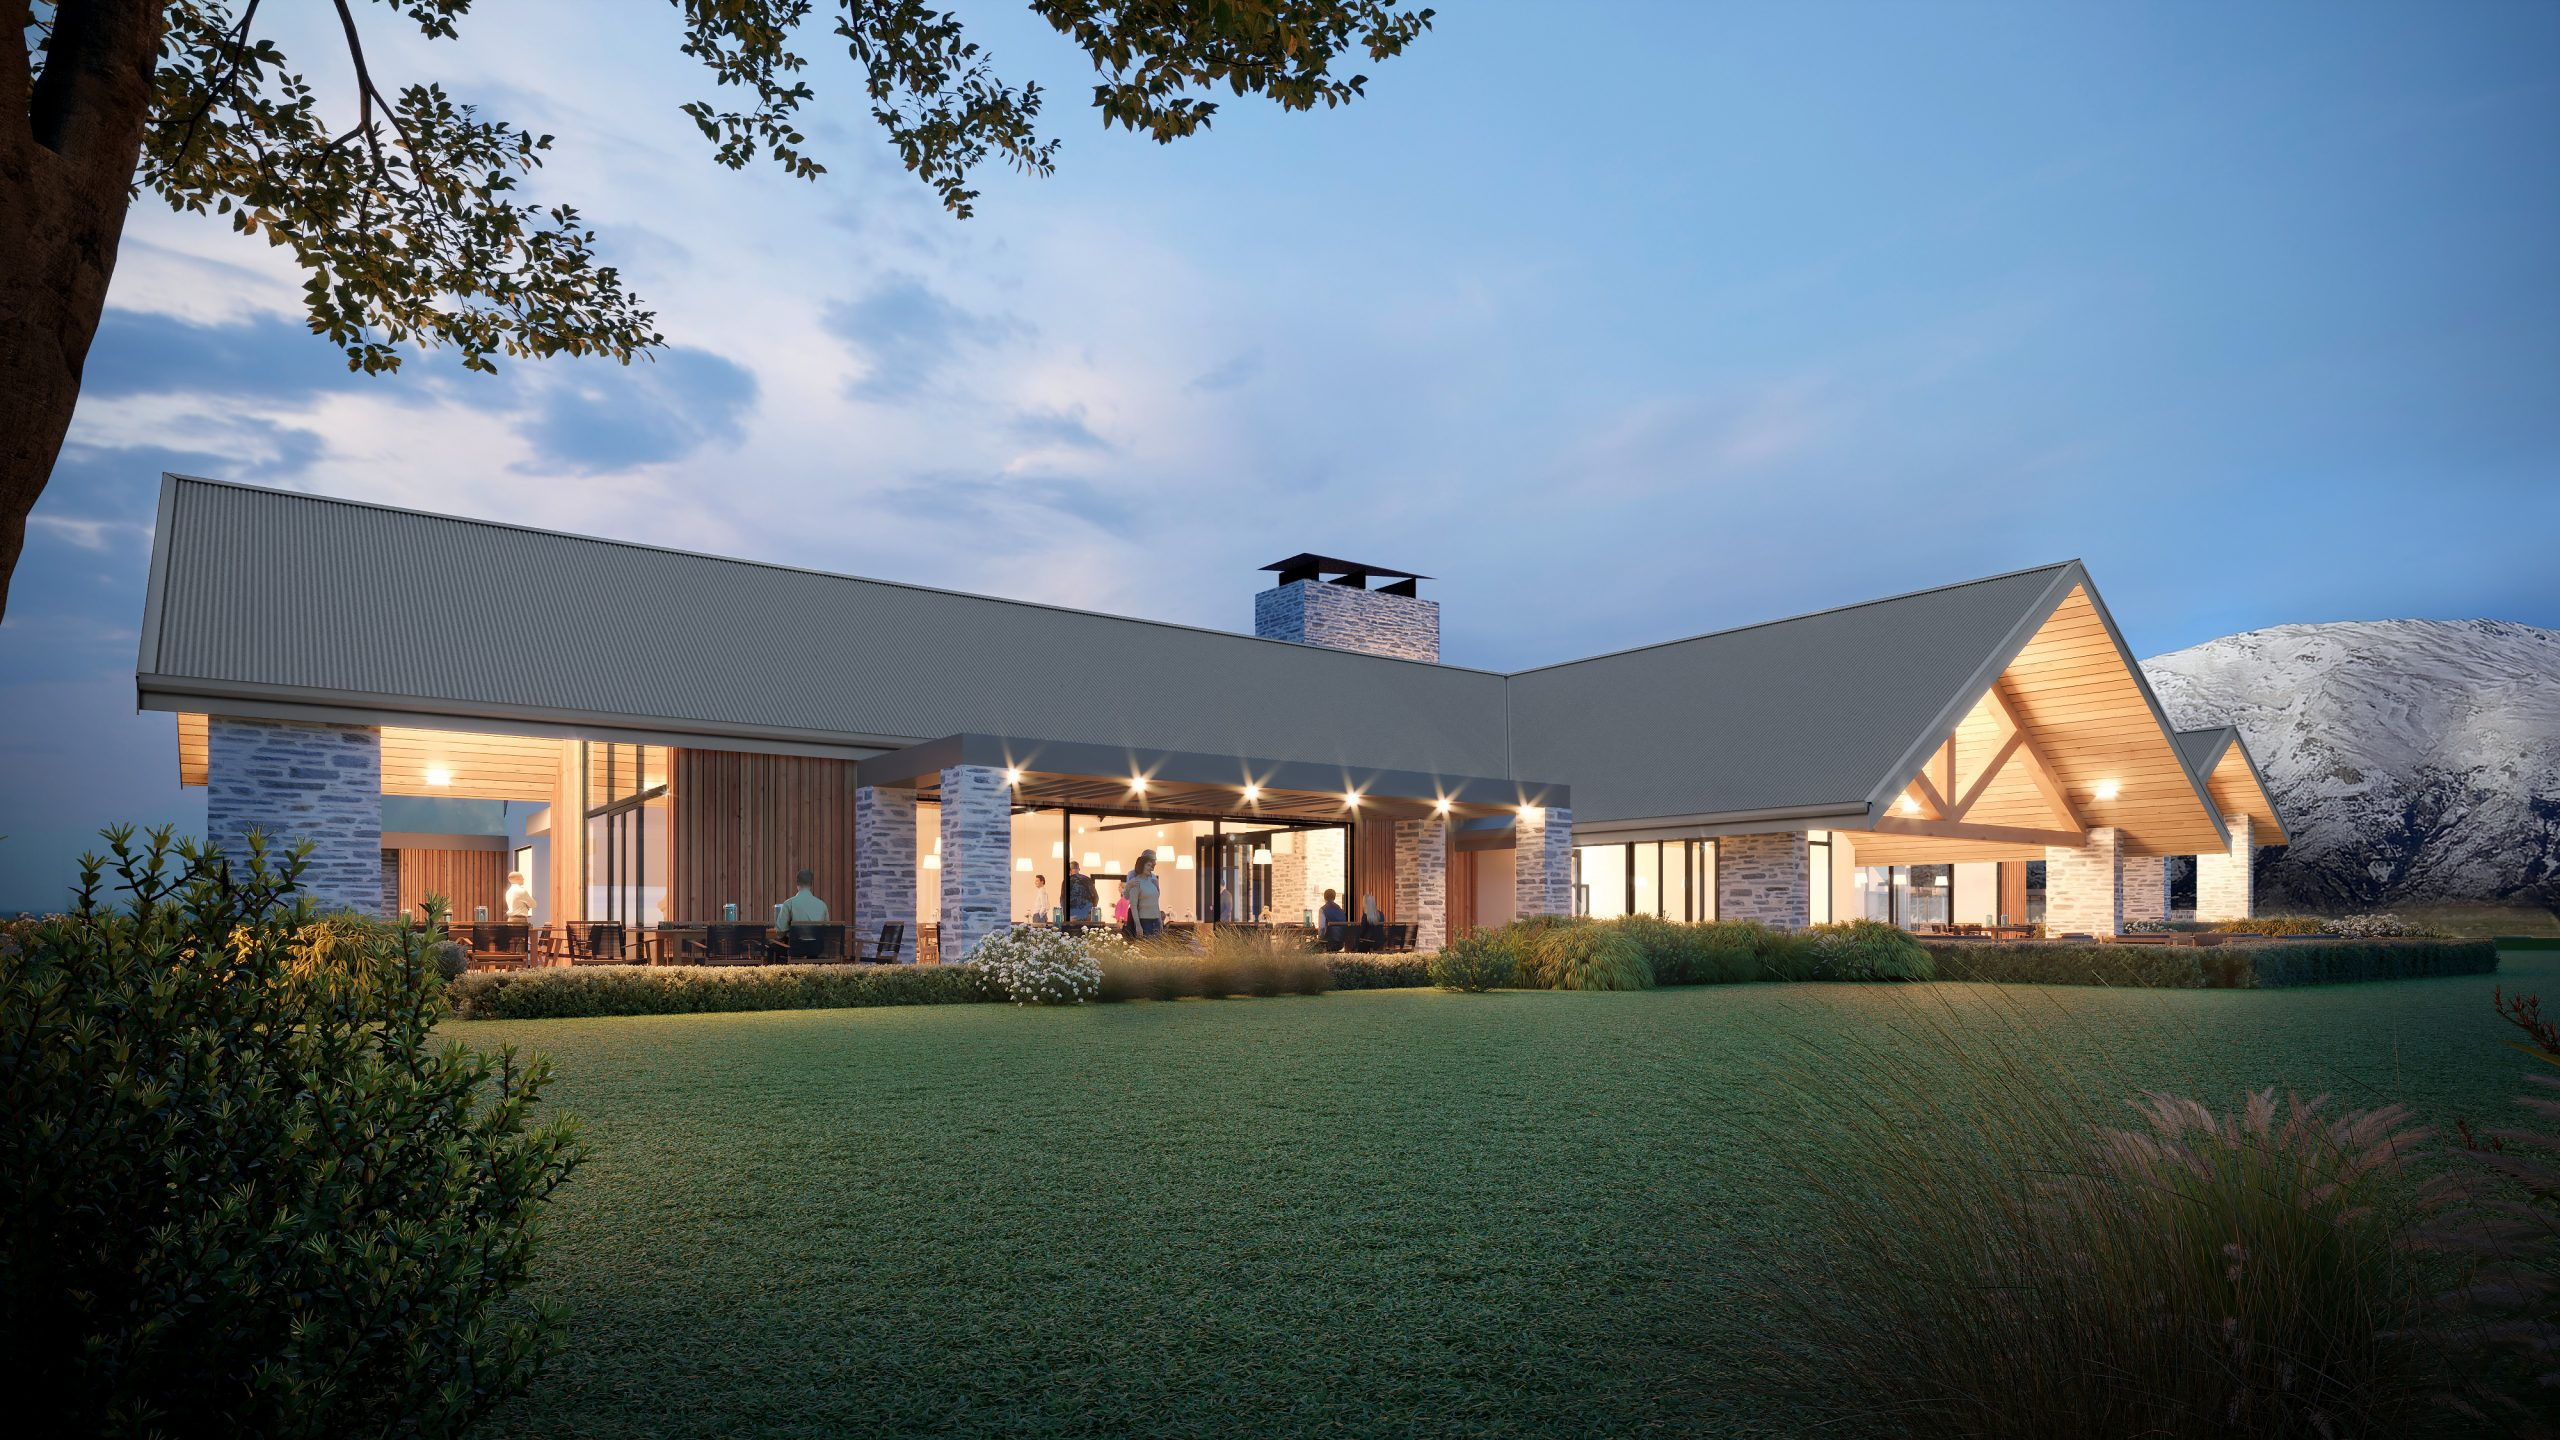 Photo of Lodge Exterior